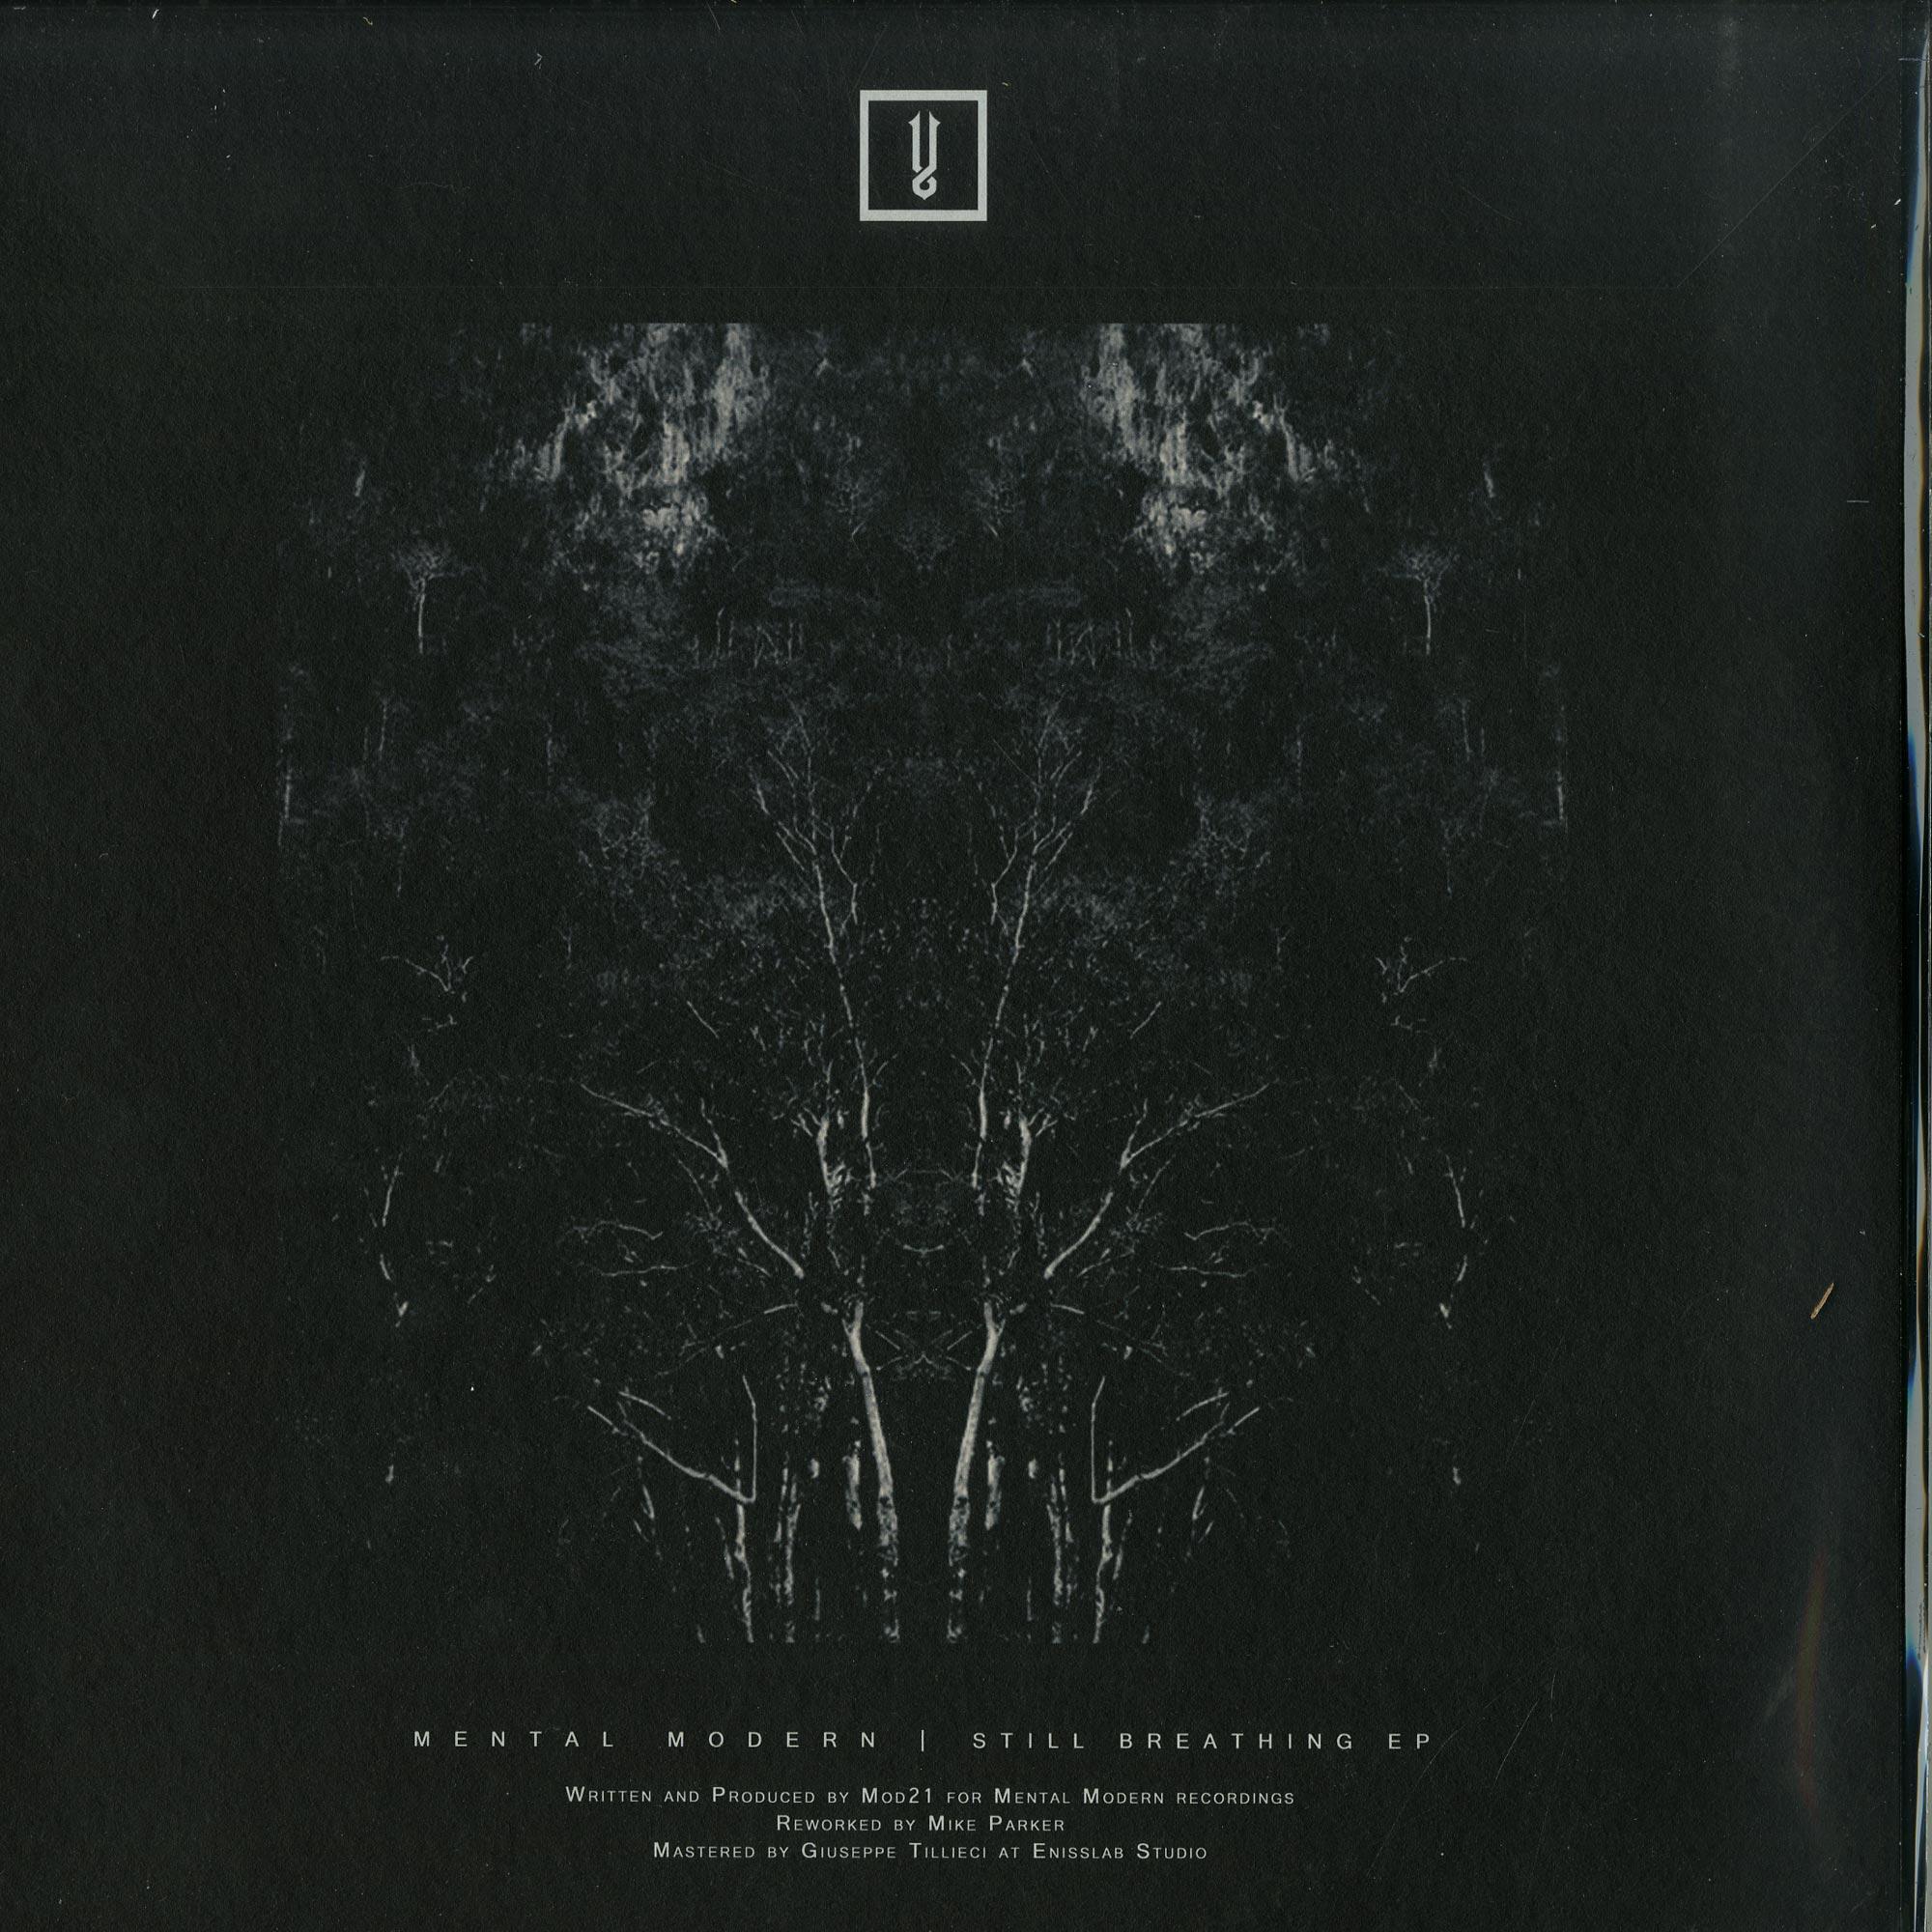 Mod21 - STILL BREATHING EP